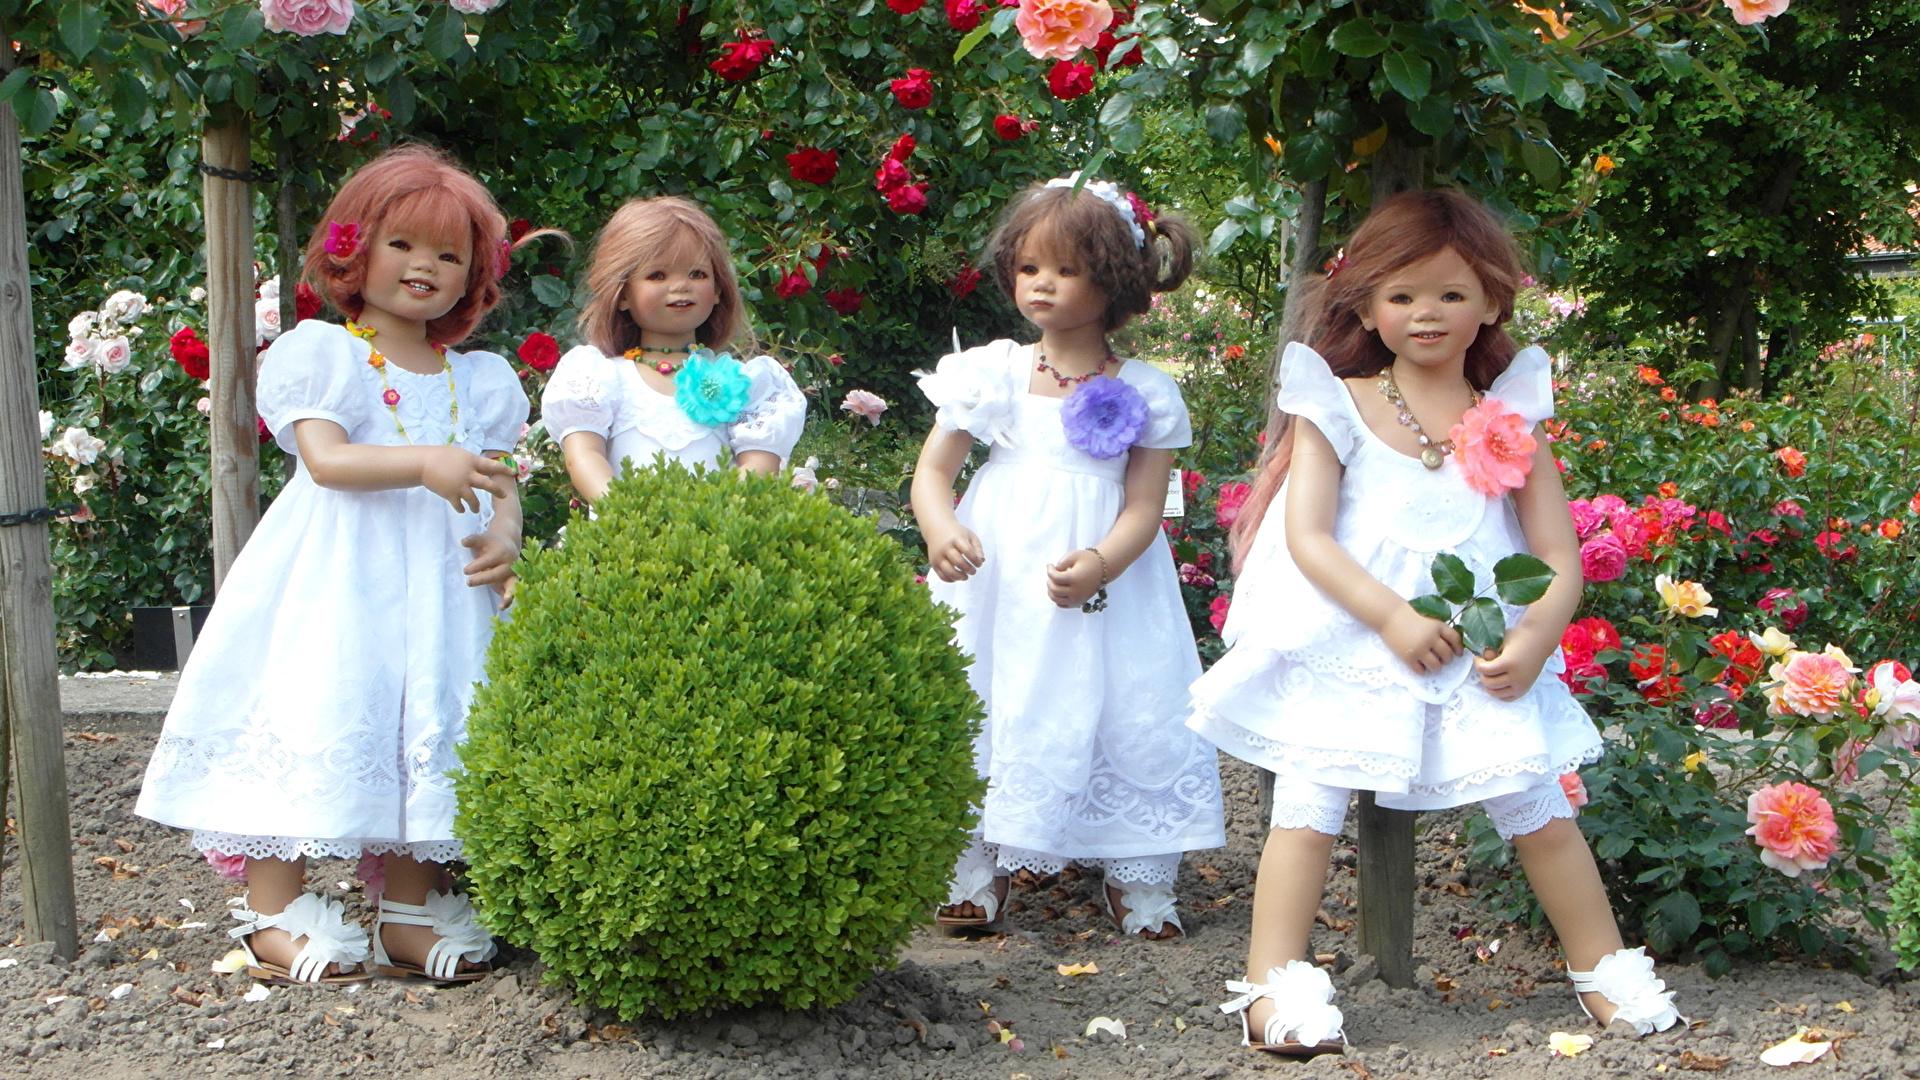 Tips how to get cheap flower girl dresses?